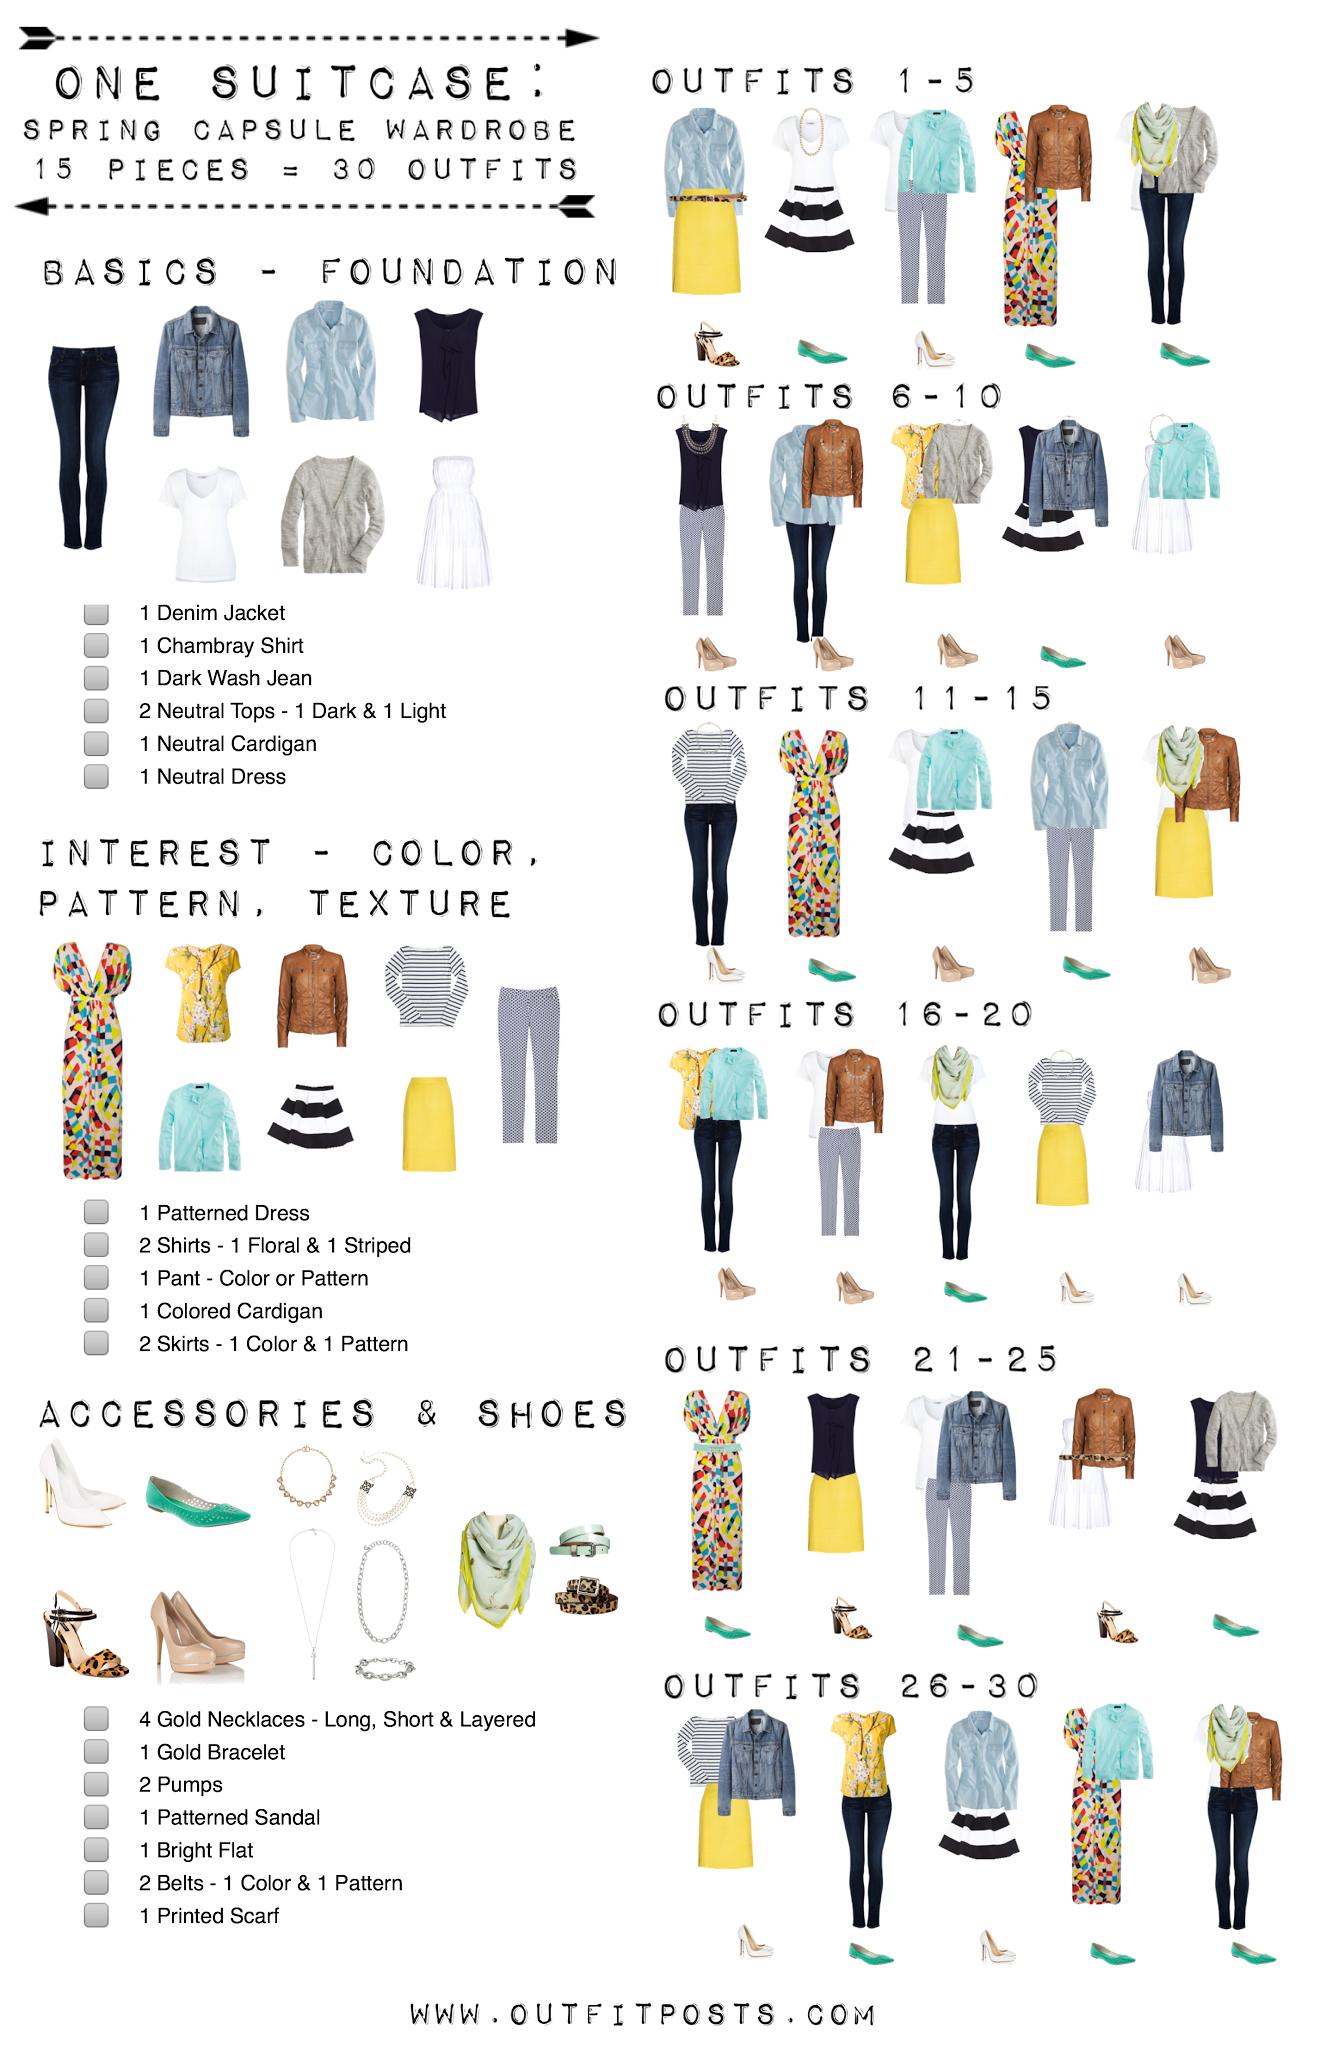 Spring Capsule Wardrobe: One Suitcase: Spring Capsule Wardrobe